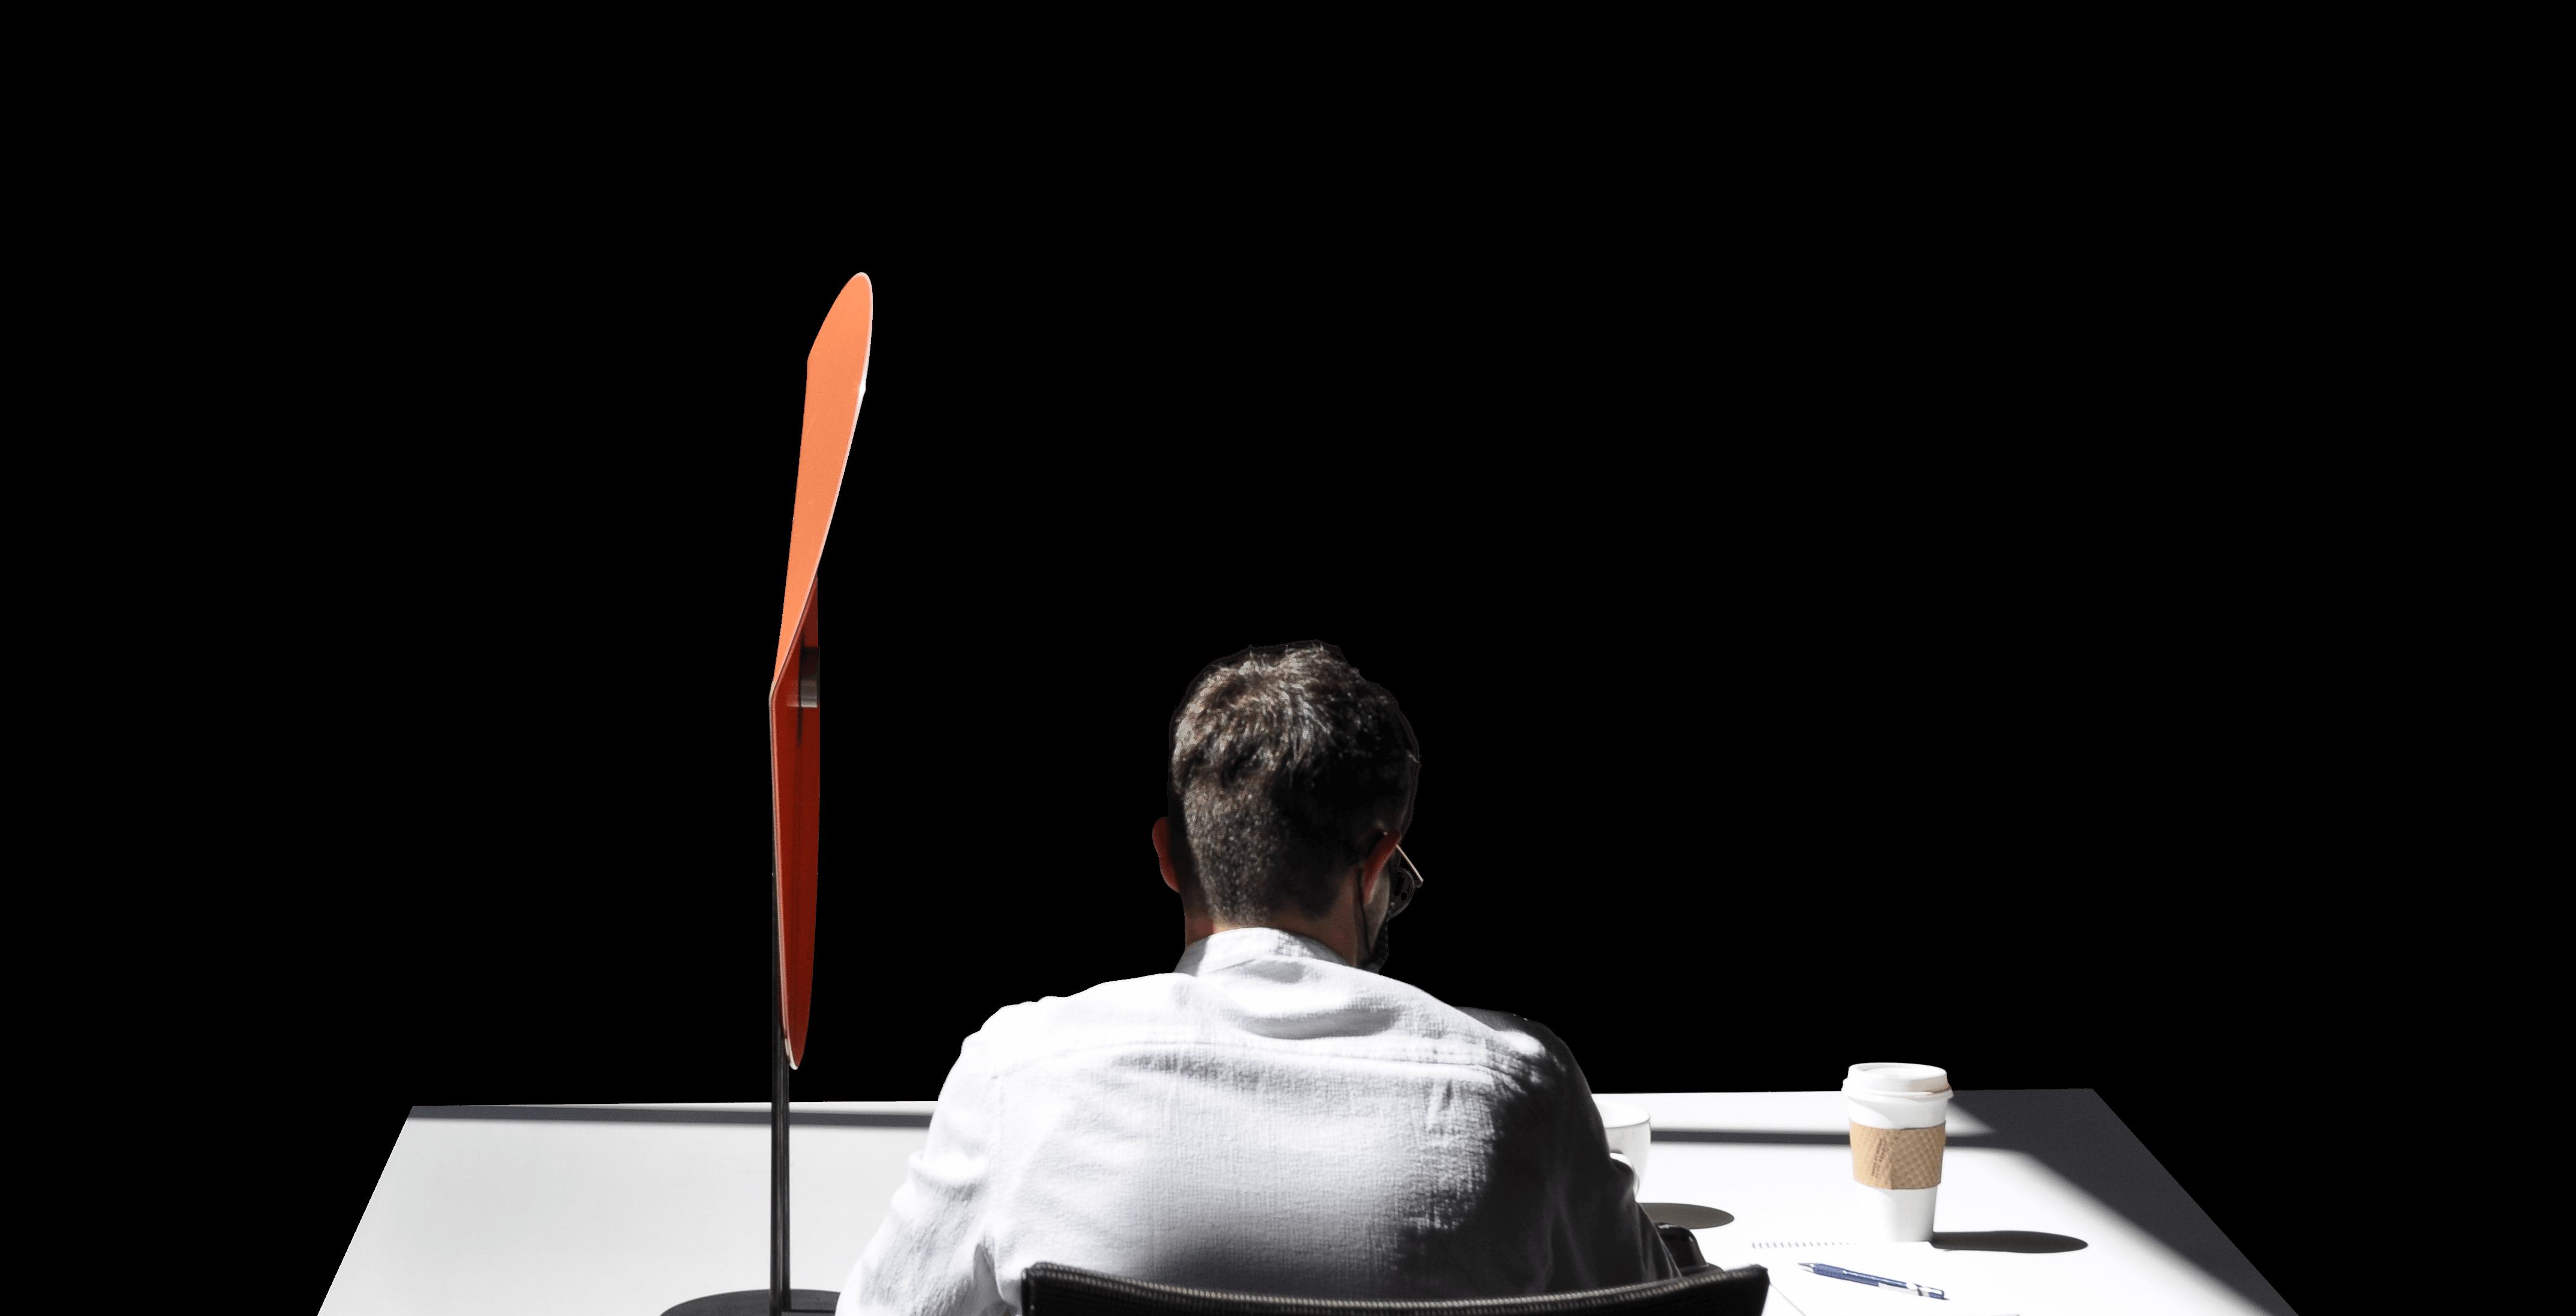 A man sitting at a desk with a Taskshade.